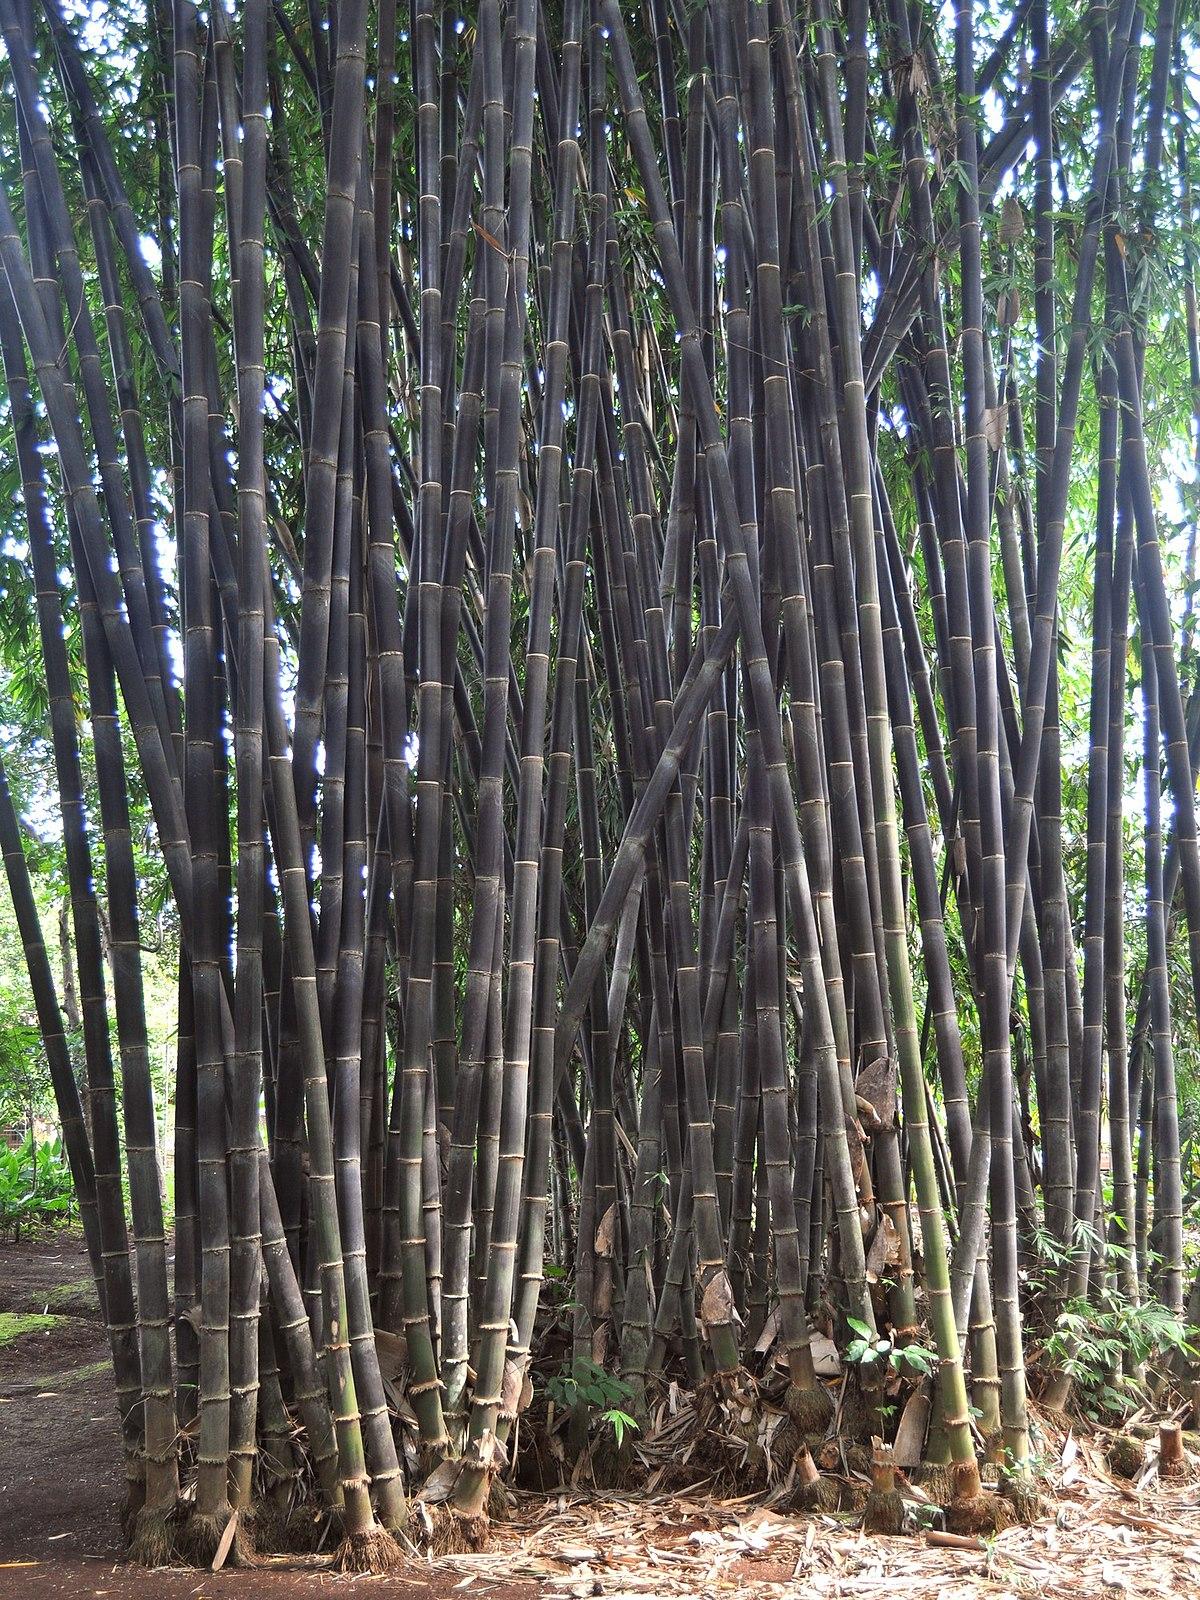 Bambu hitam - Wikipedia bahasa Indonesia, ensiklopedia bebas